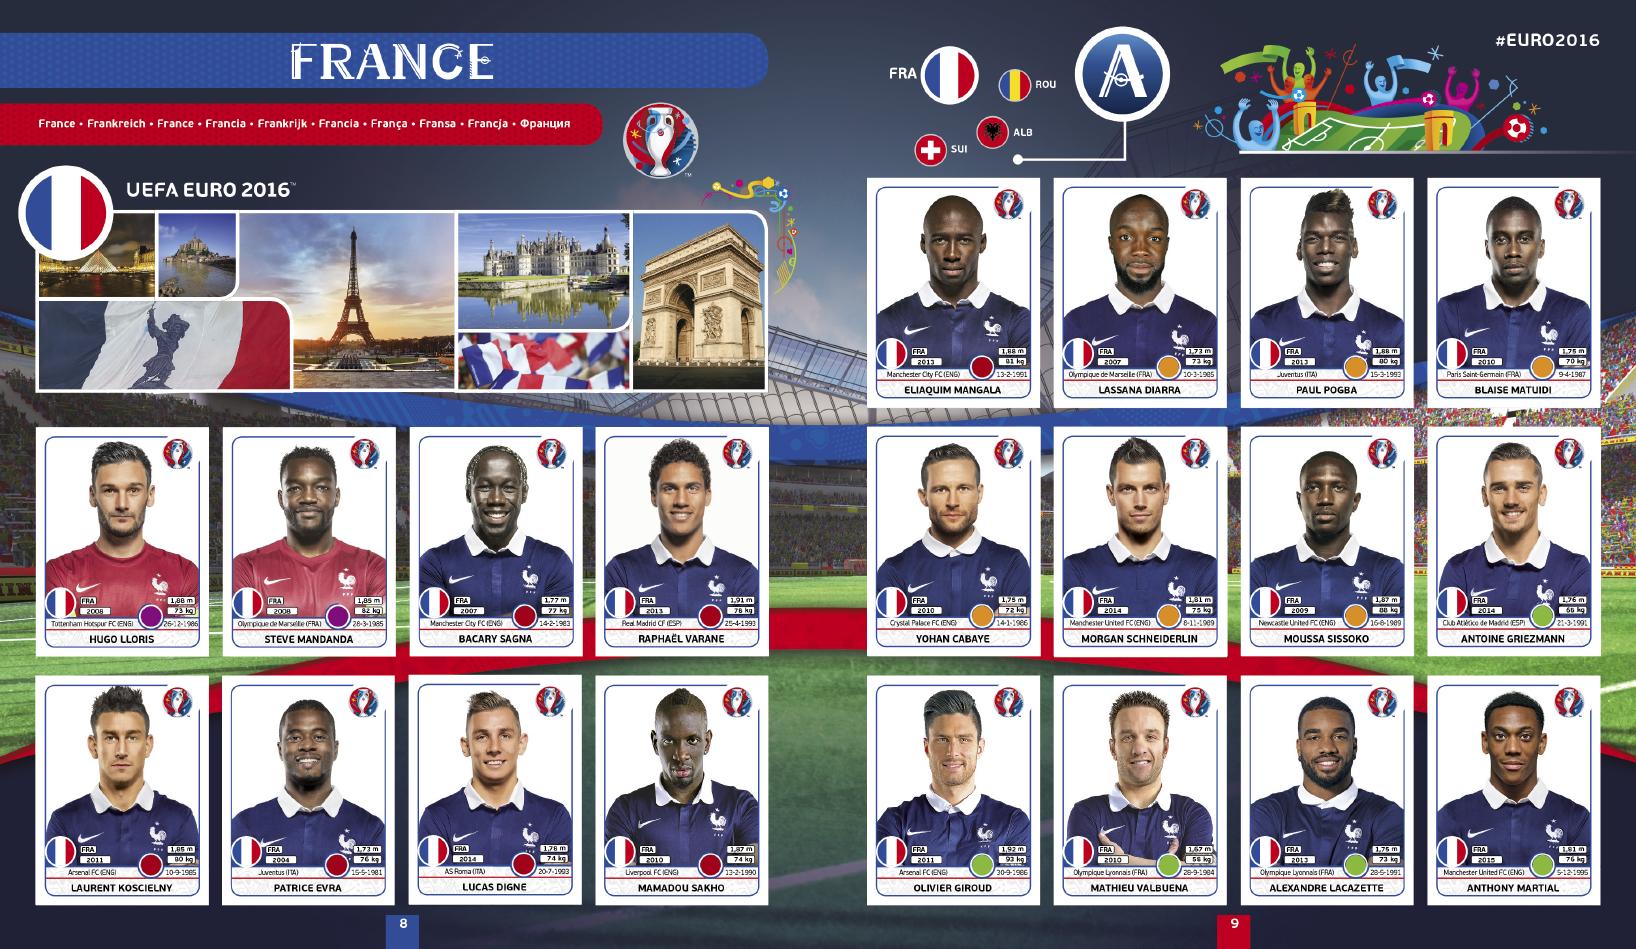 Karim Benzema album Panini UEFA EURO 2016 Equipe de France football